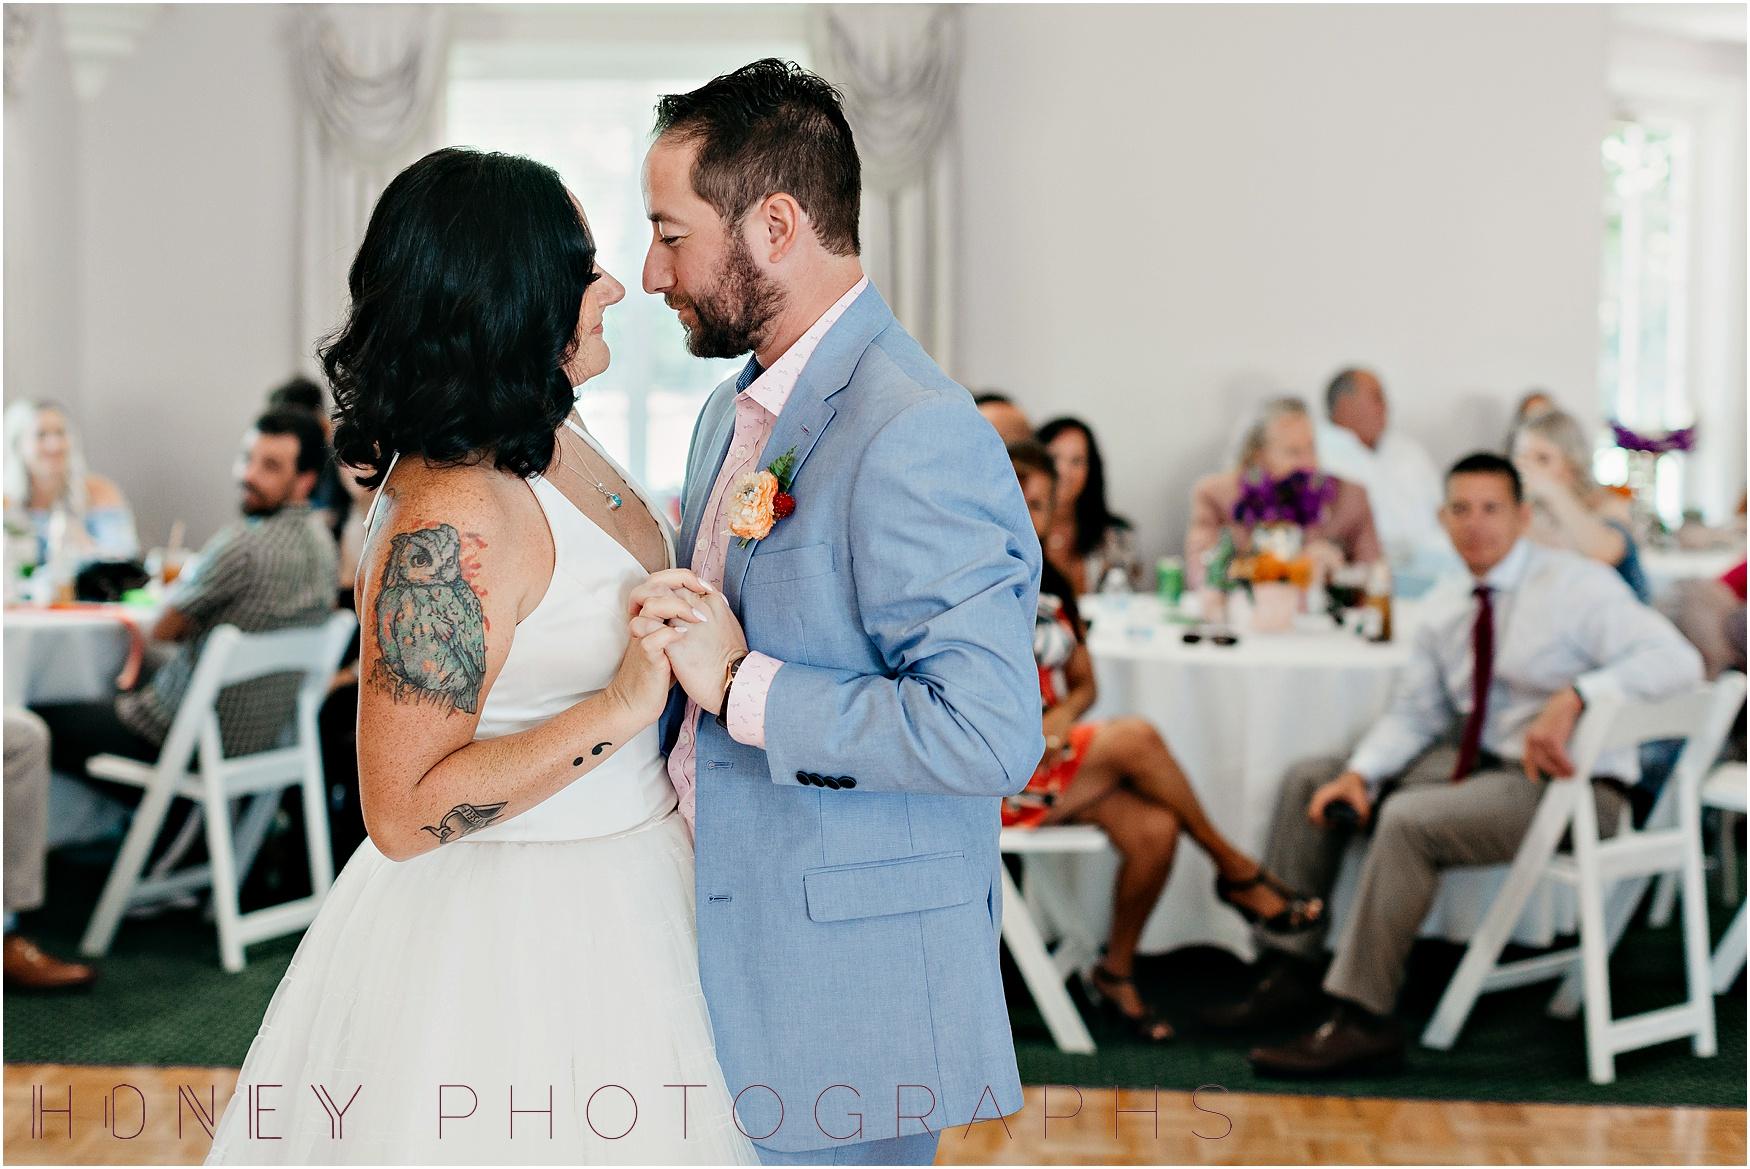 colorful_ecclectic_vibrant_vista_rainbow_quirky_wedding048.jpg